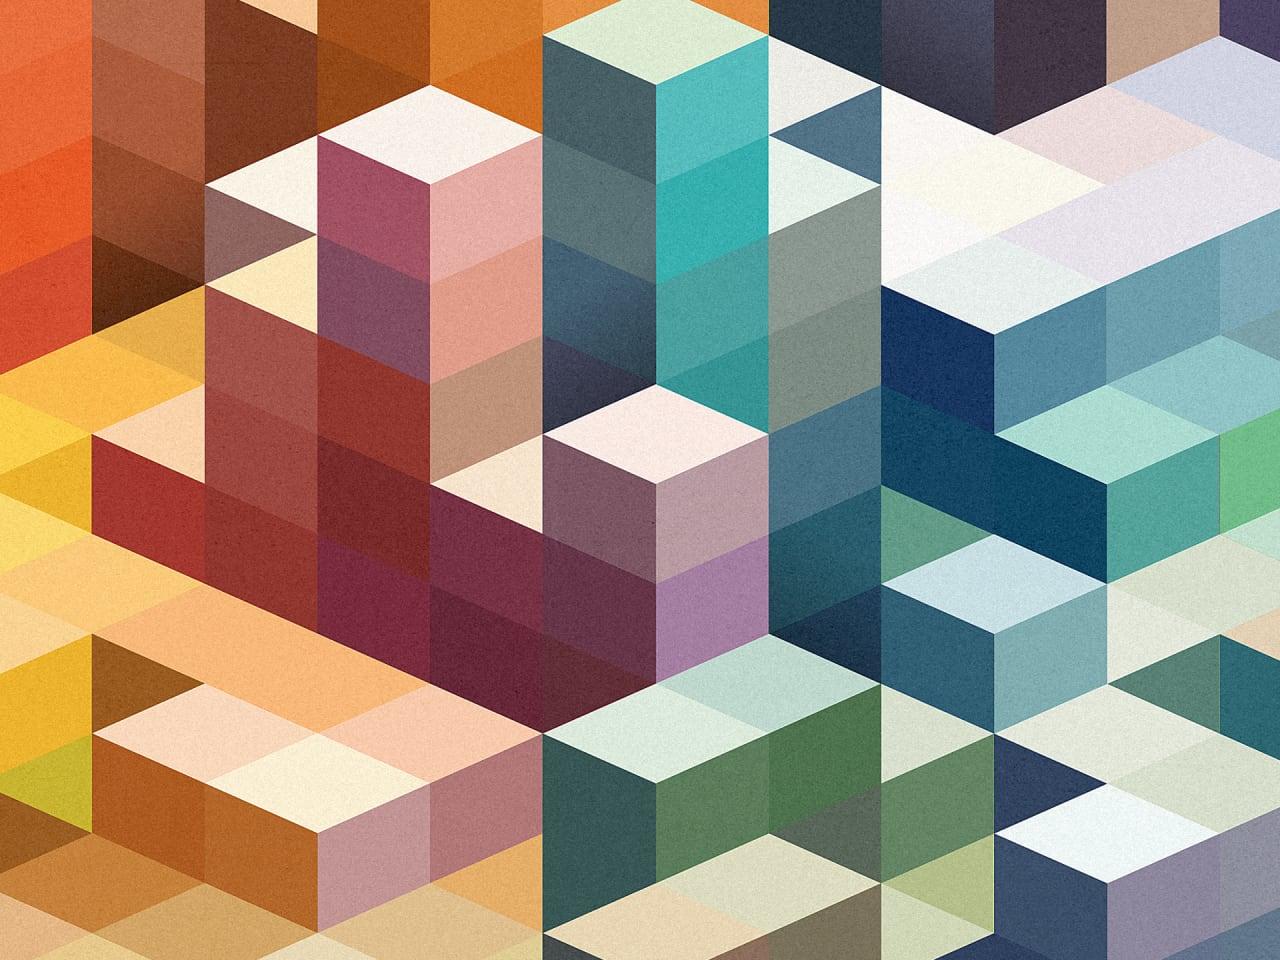 Poster design trends - Poster Design Trends 32